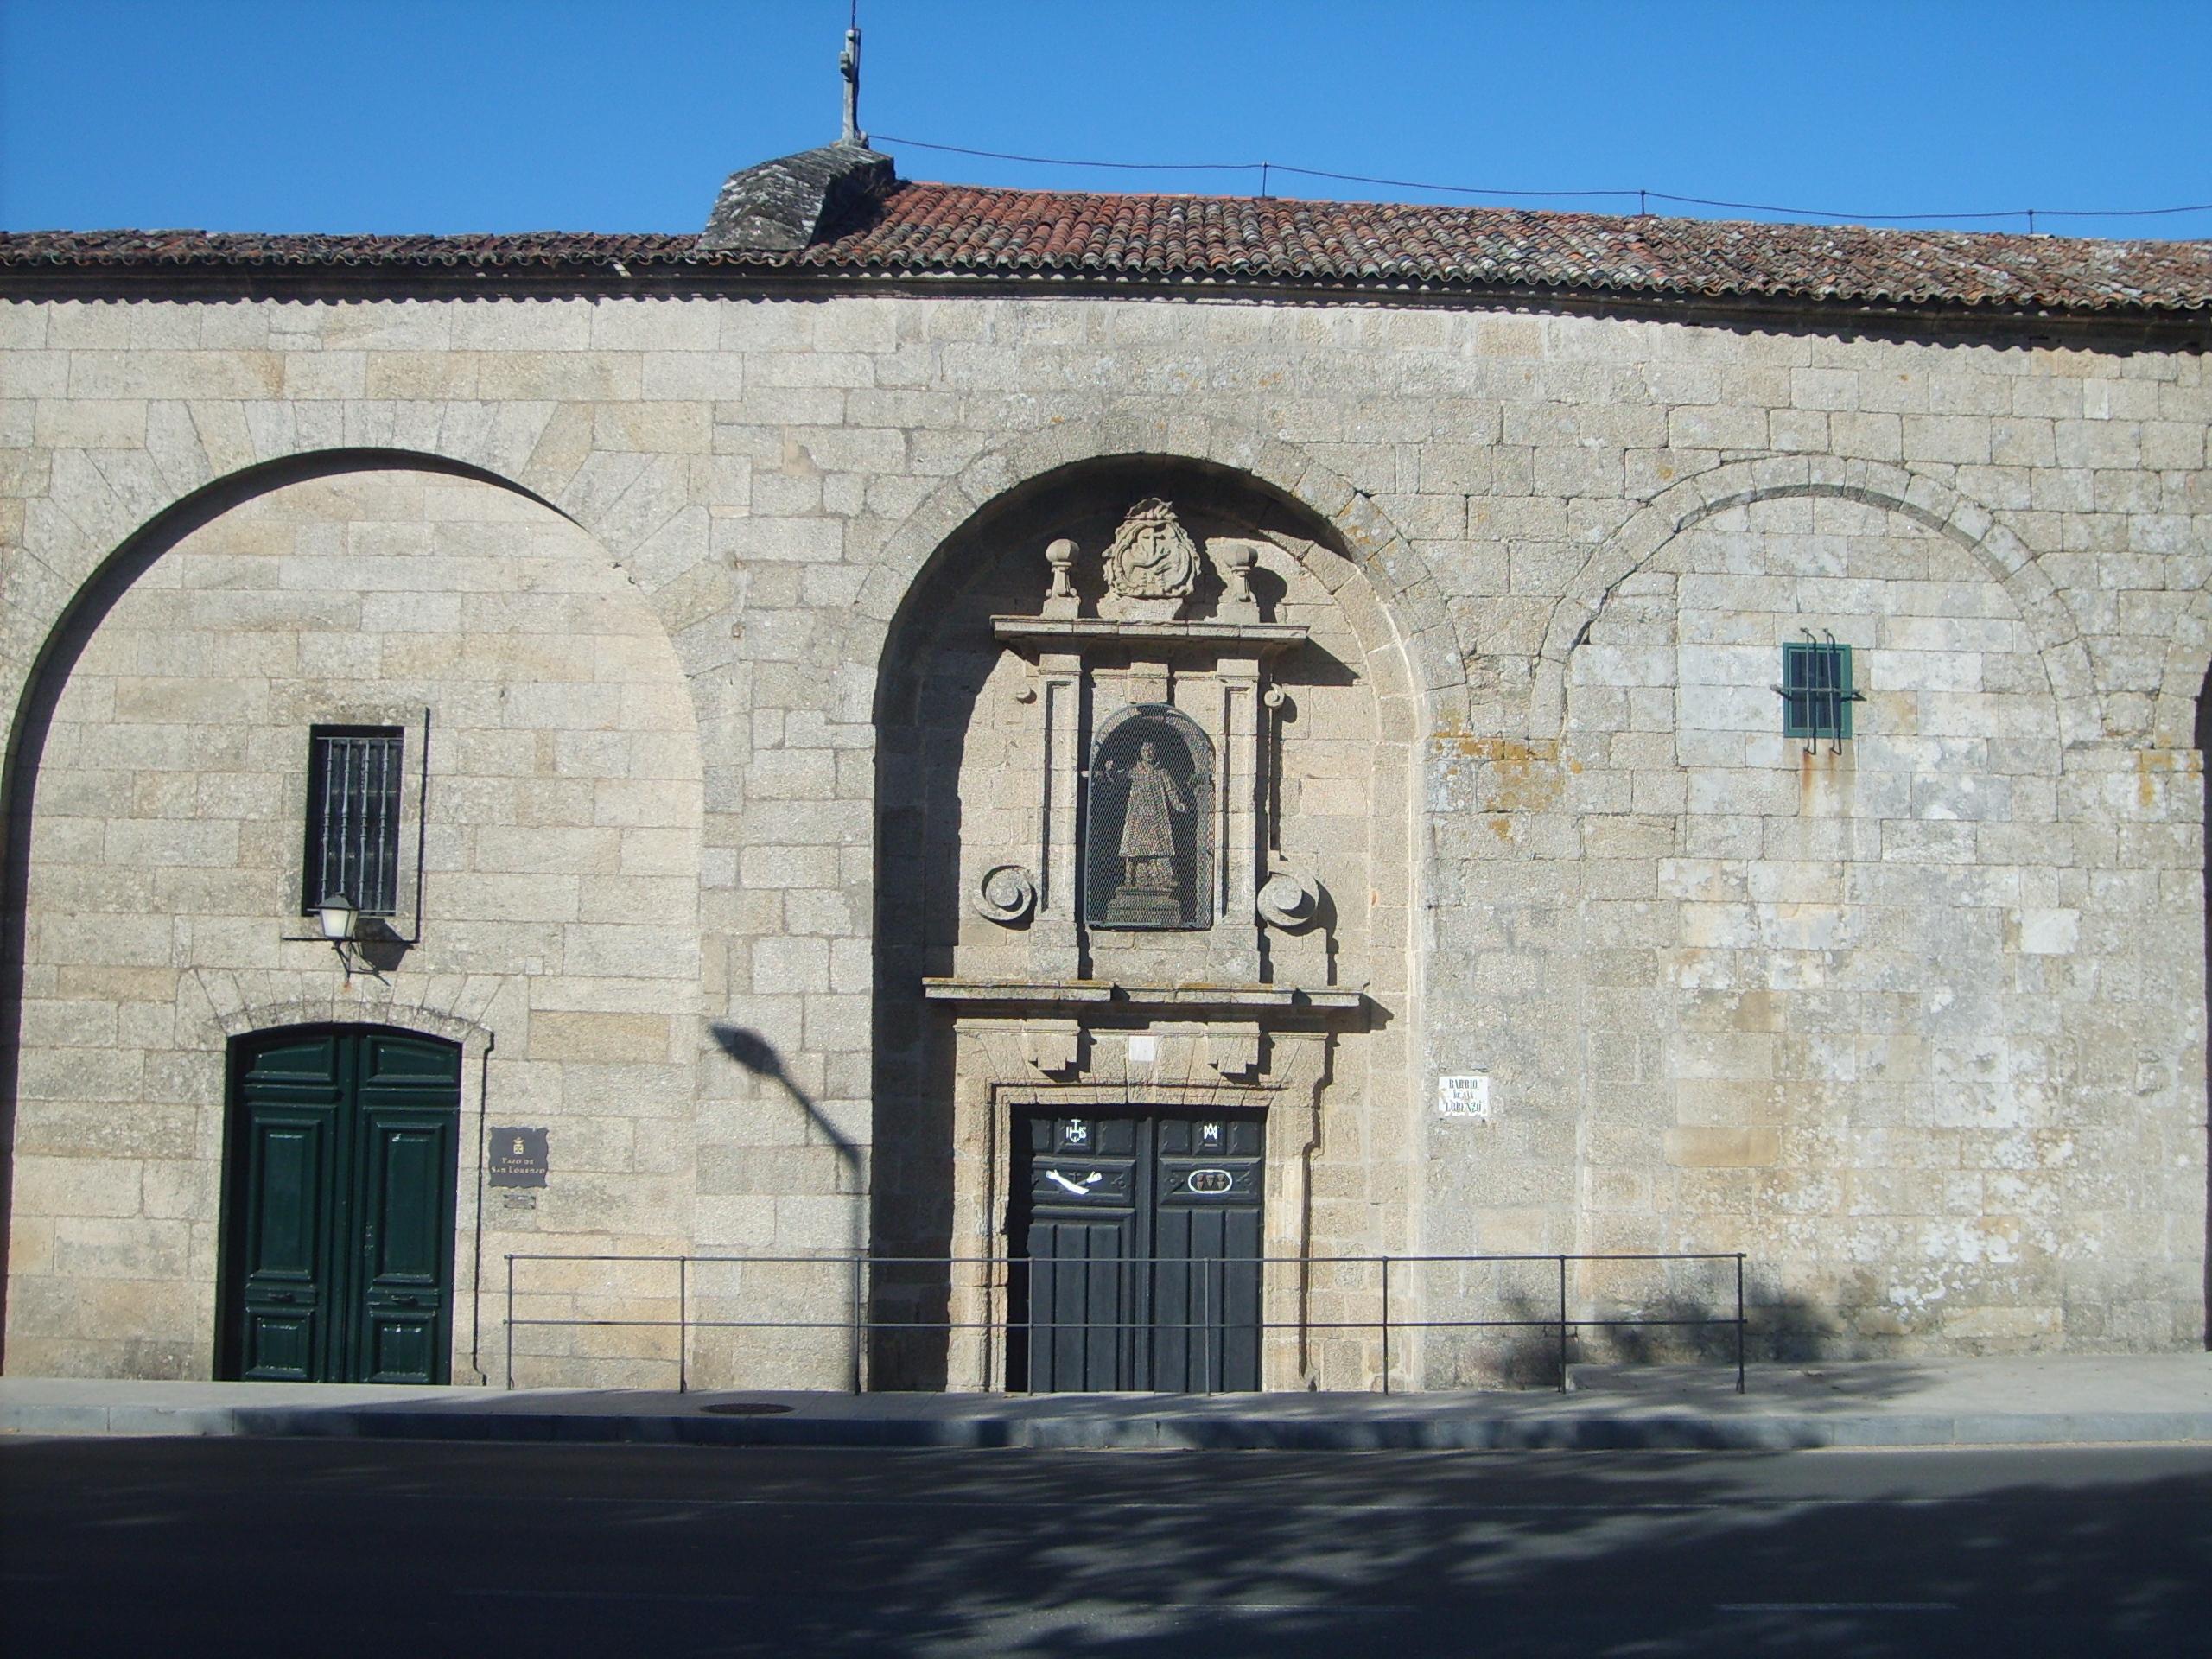 http://upload.wikimedia.org/wikipedia/commons/e/e7/Pazo_de_San_Lorenzo_-_Santiago_de_Compostela_-_03.JPG